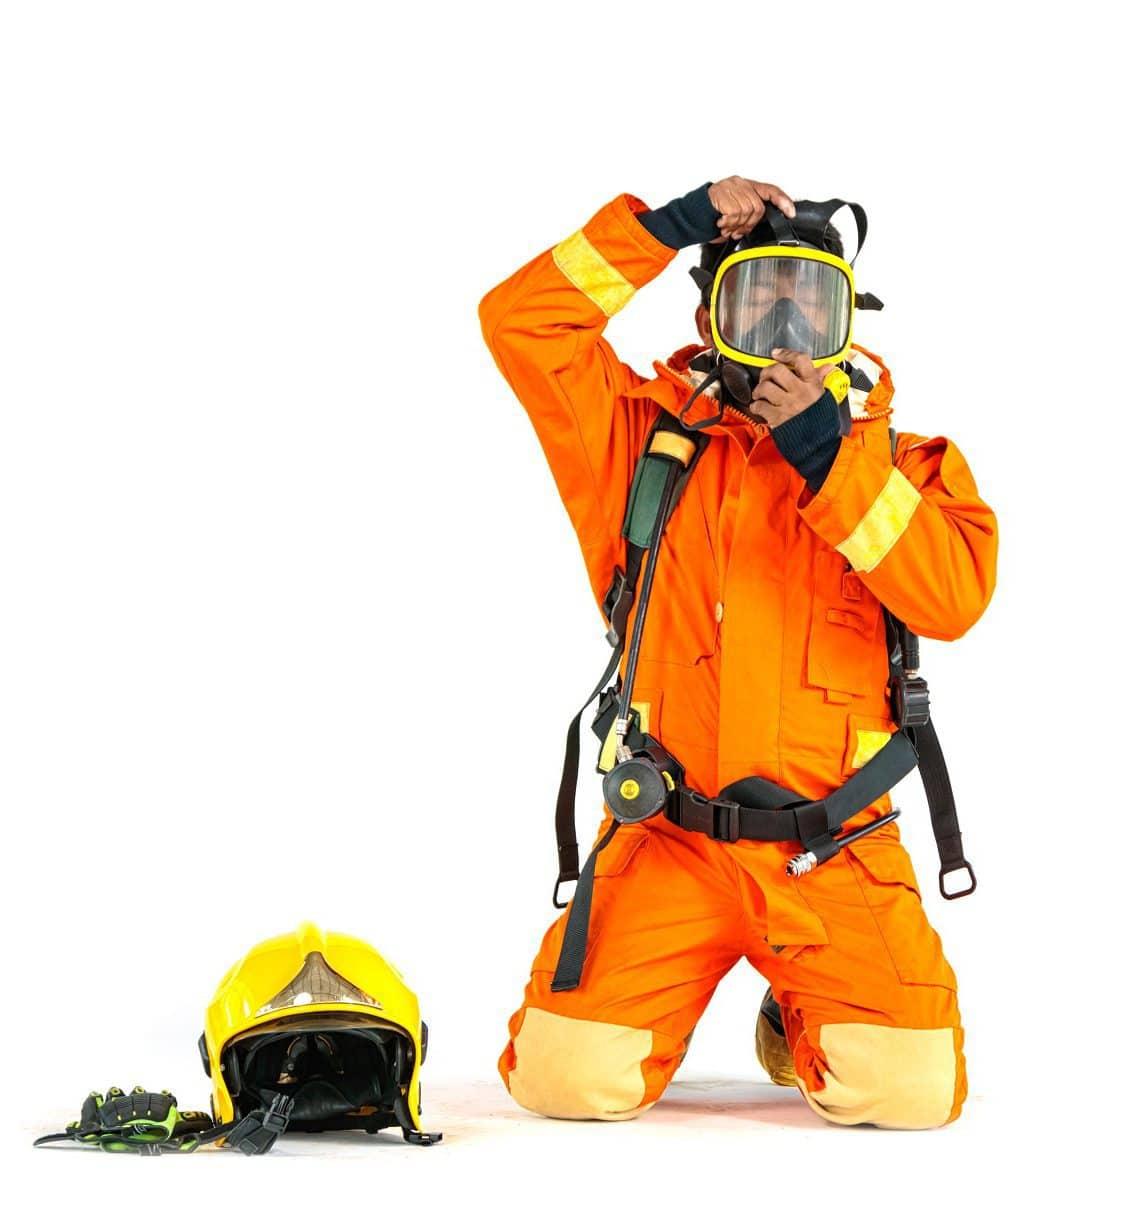 Firefighter In Uniform And Safety Helmet Standing Full Body Leng